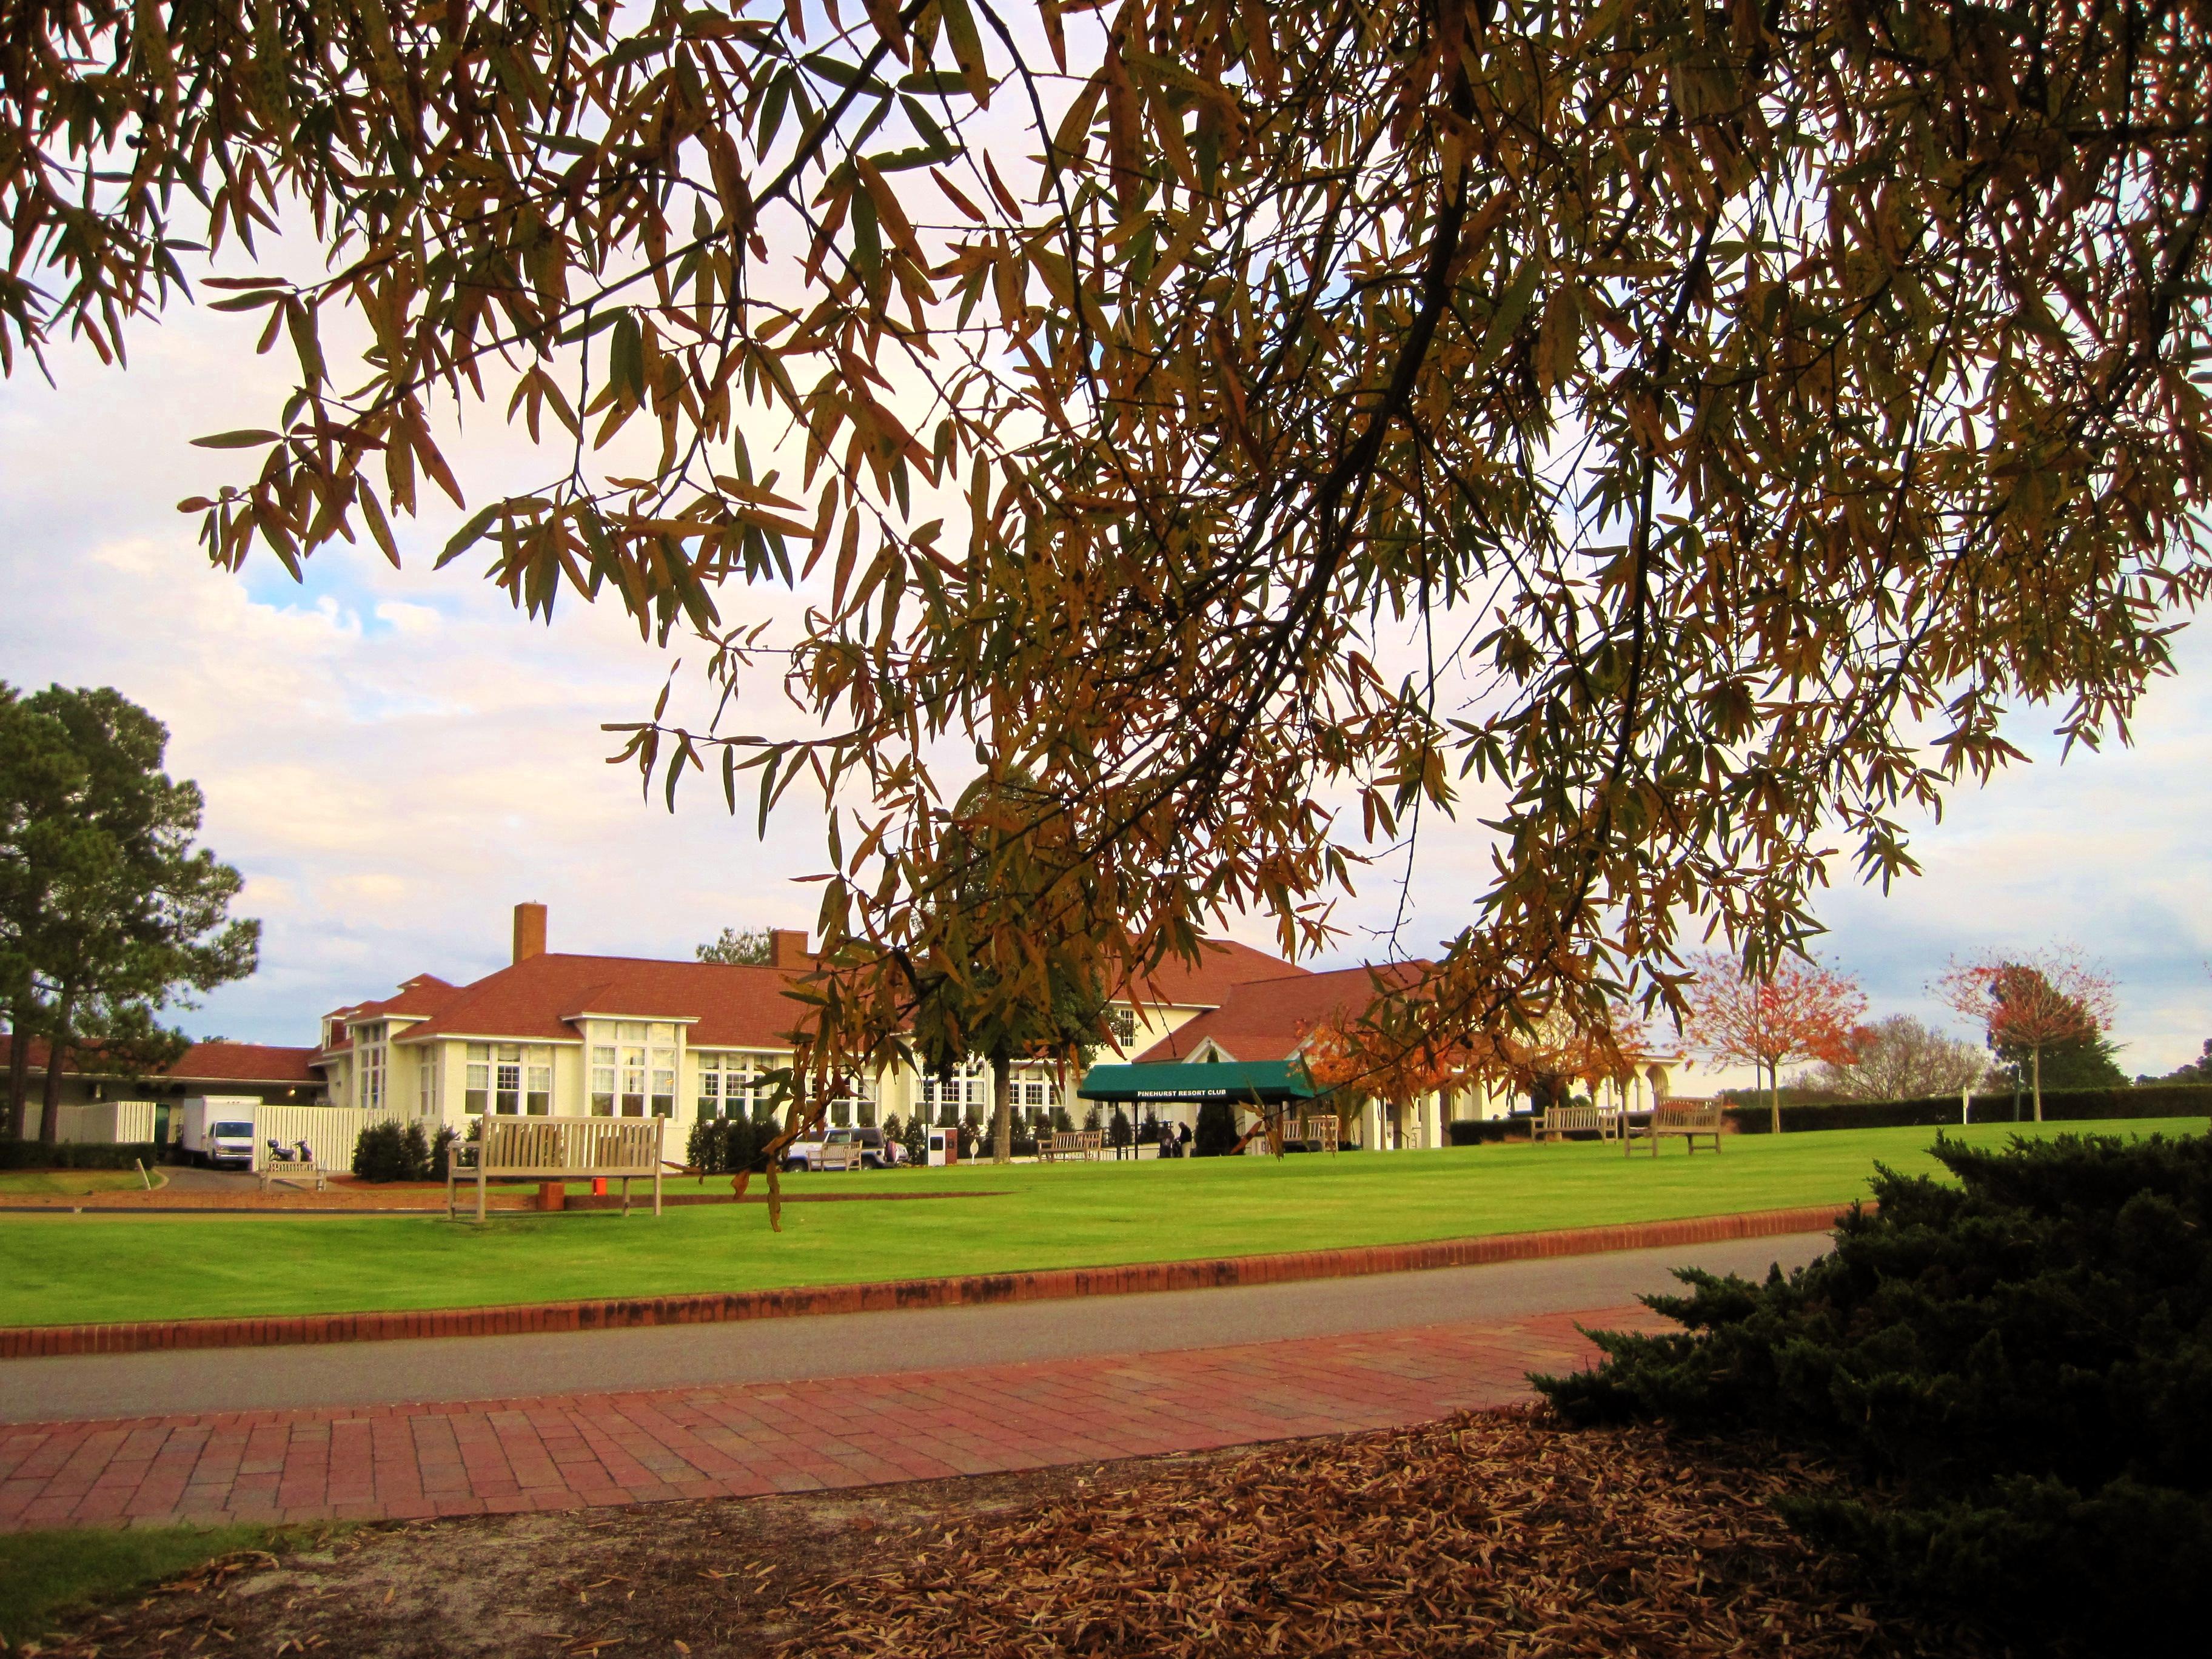 The Resort Club at Pinehurst